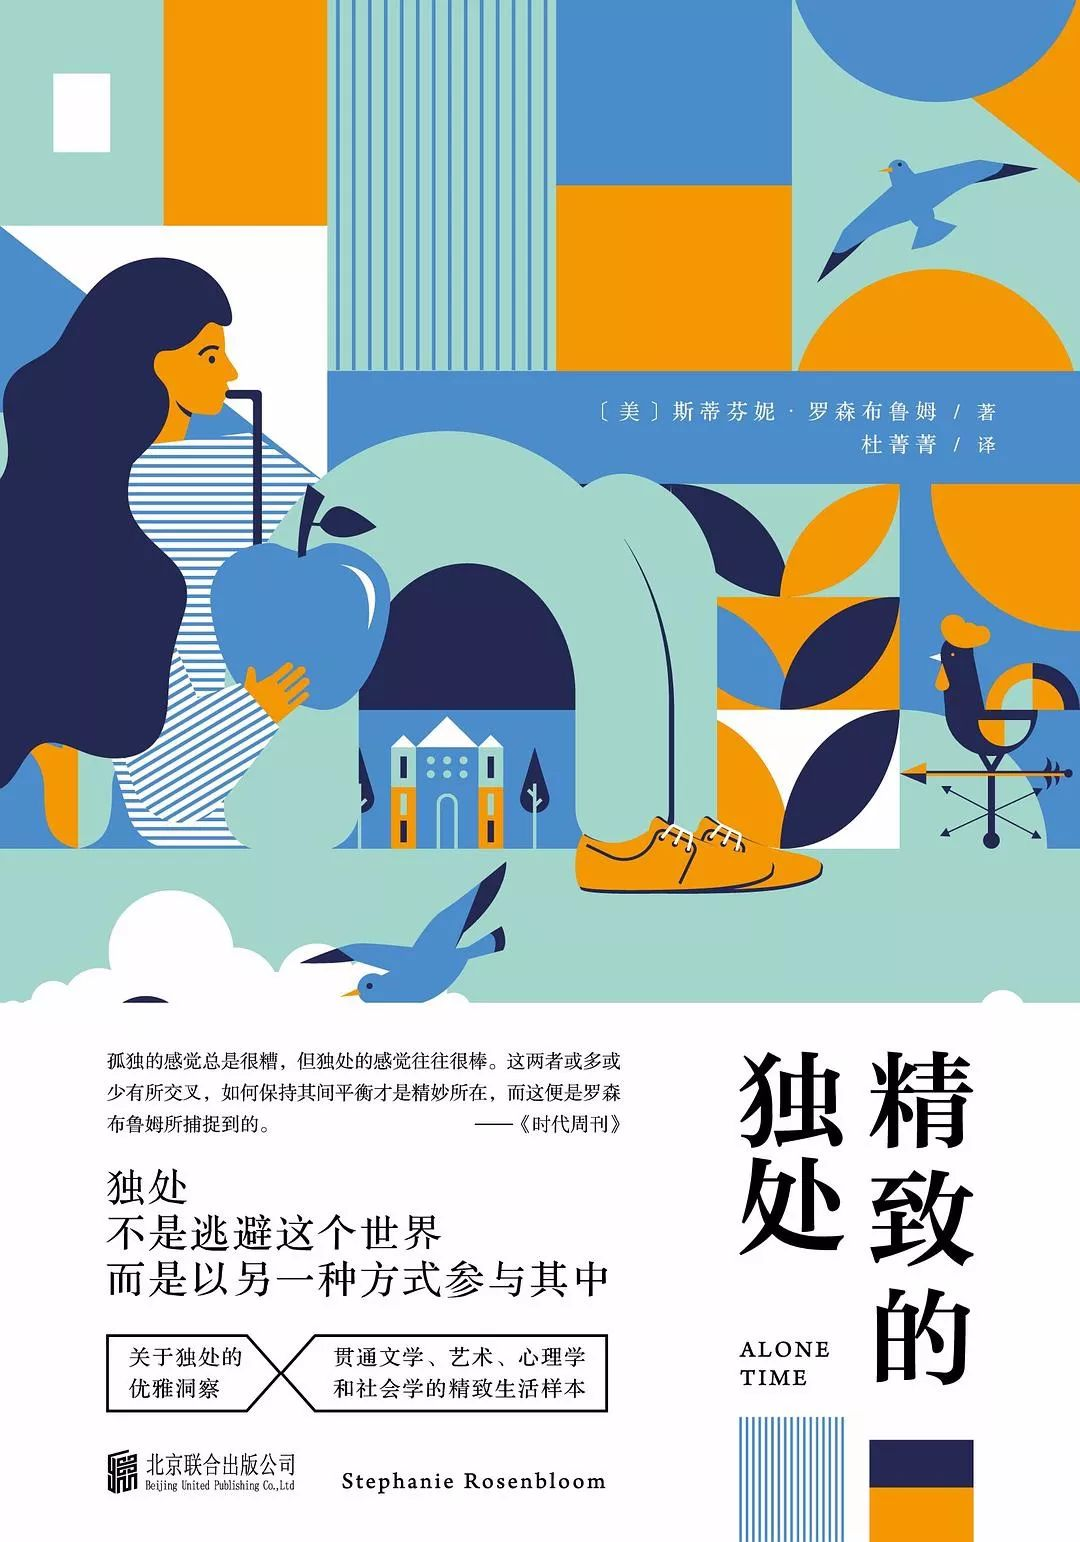 rentiyishu杜菁菁_《精致的独处》 (美)斯蒂芬妮·罗森布鲁姆 / 著 杜菁菁 / 译 未读